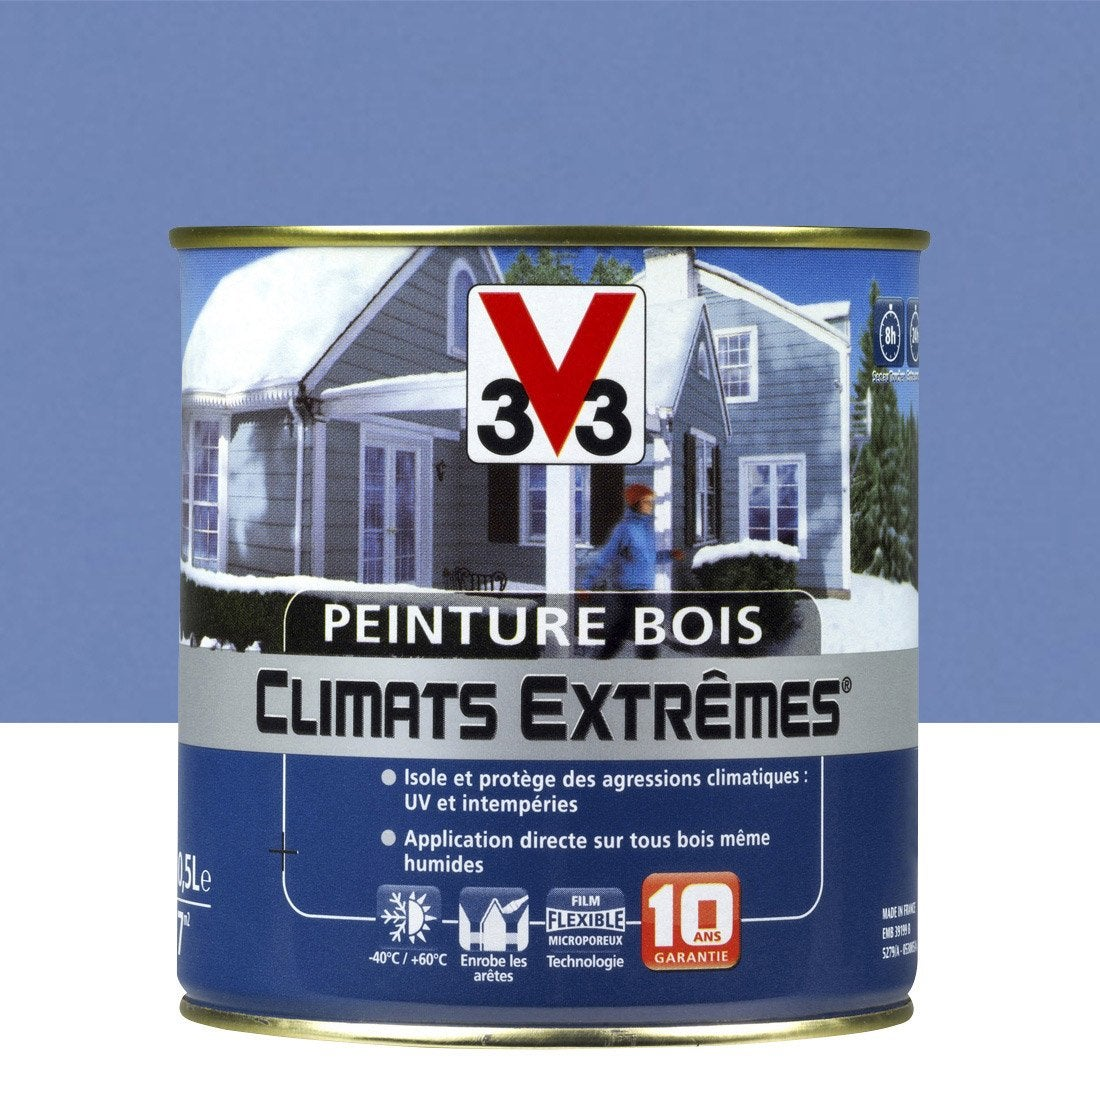 peinture bois ext rieur climats extr mes v33 brillant lavande 0 5l leroy merlin. Black Bedroom Furniture Sets. Home Design Ideas